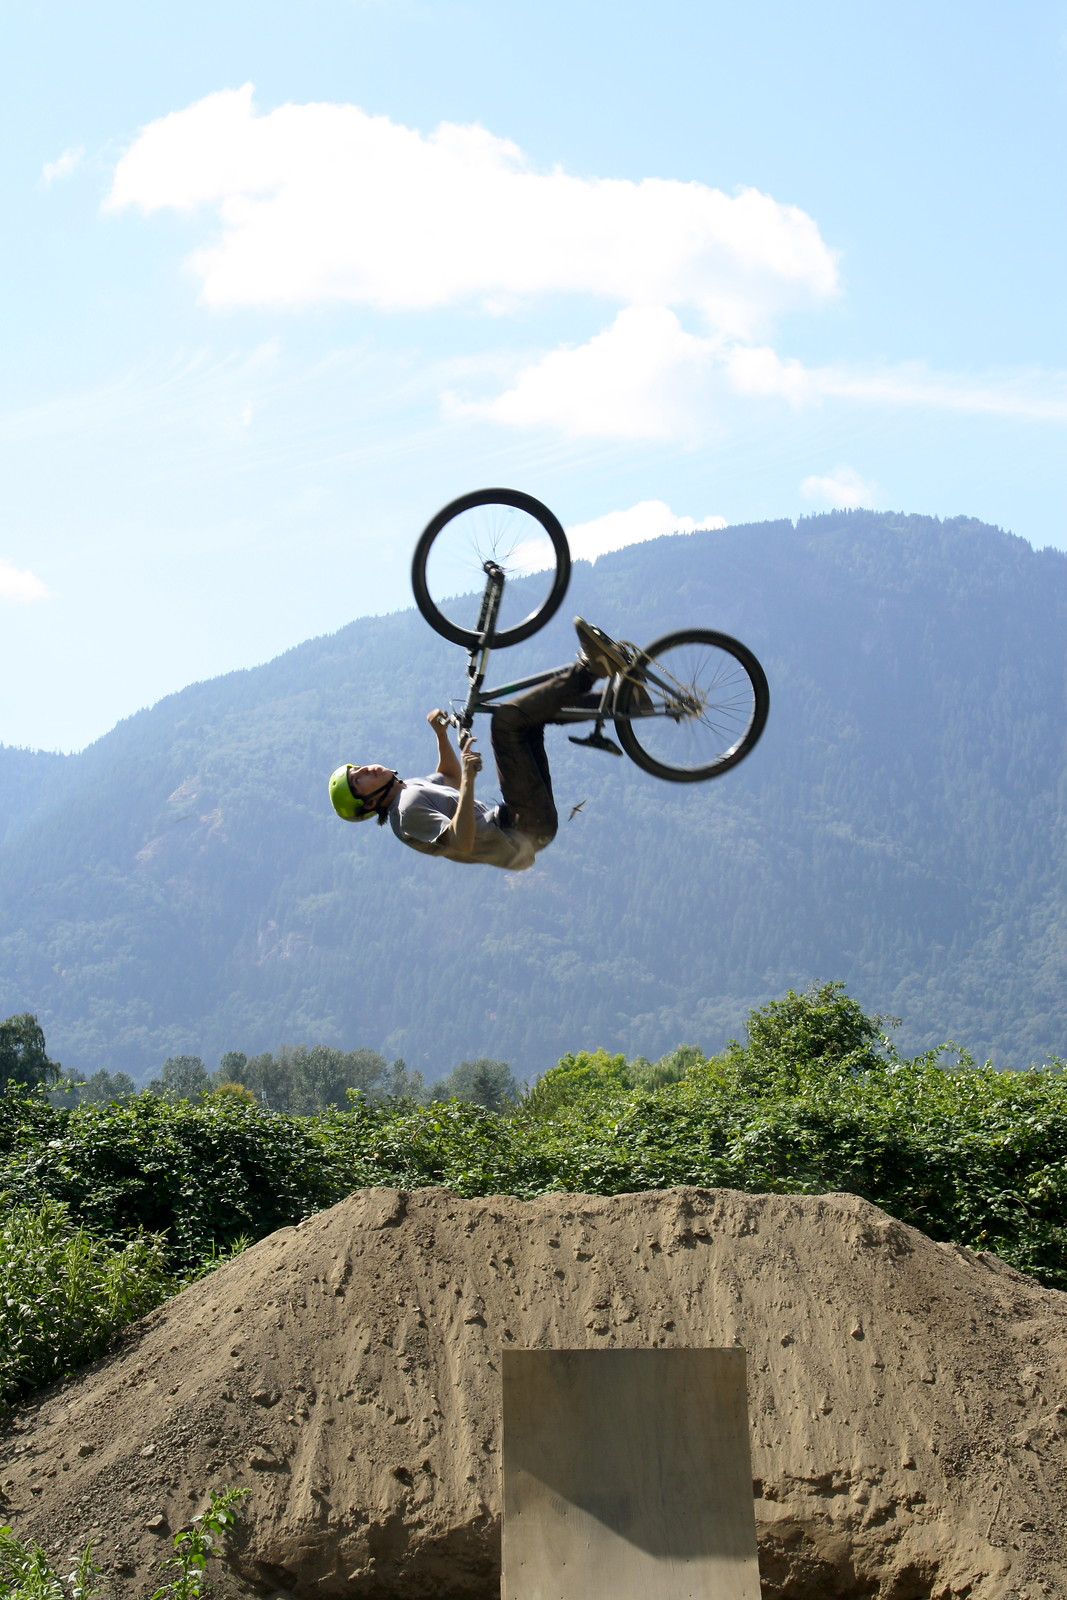 IMG_2540 - samhein - Mountain Biking Pictures - Vital MTB